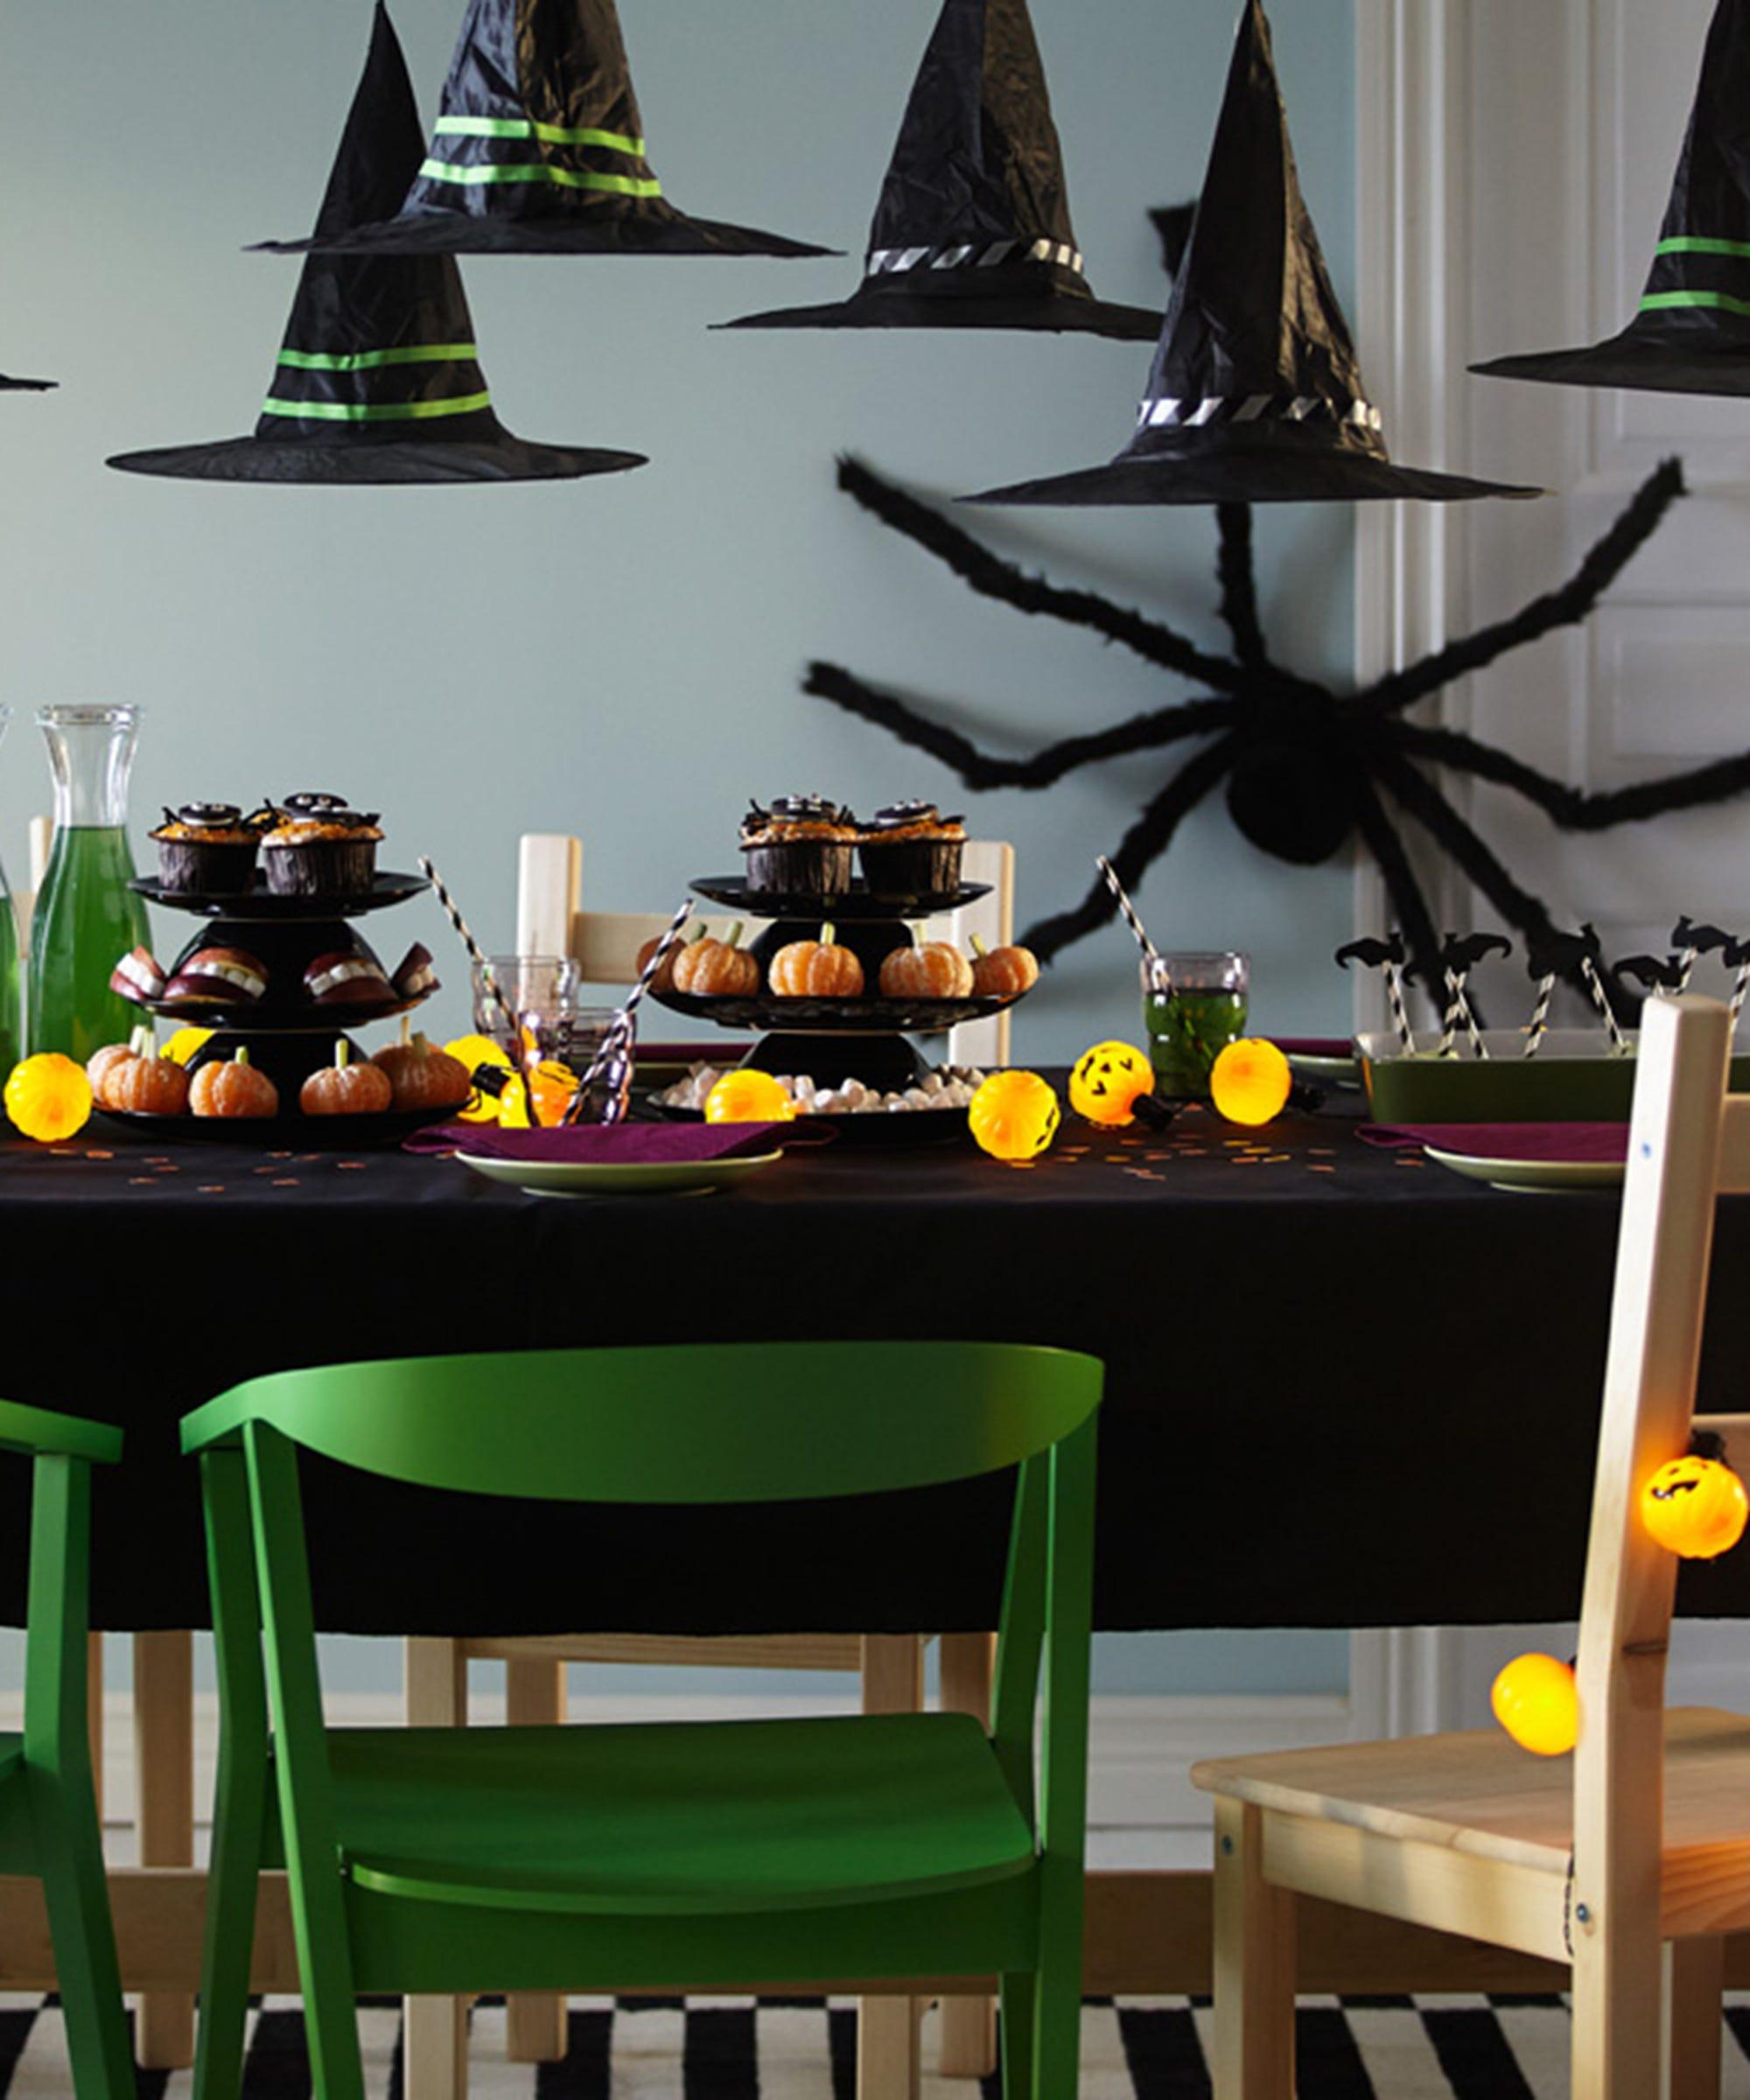 target halloween decor shopping photos - Cheapest Halloween Decorations